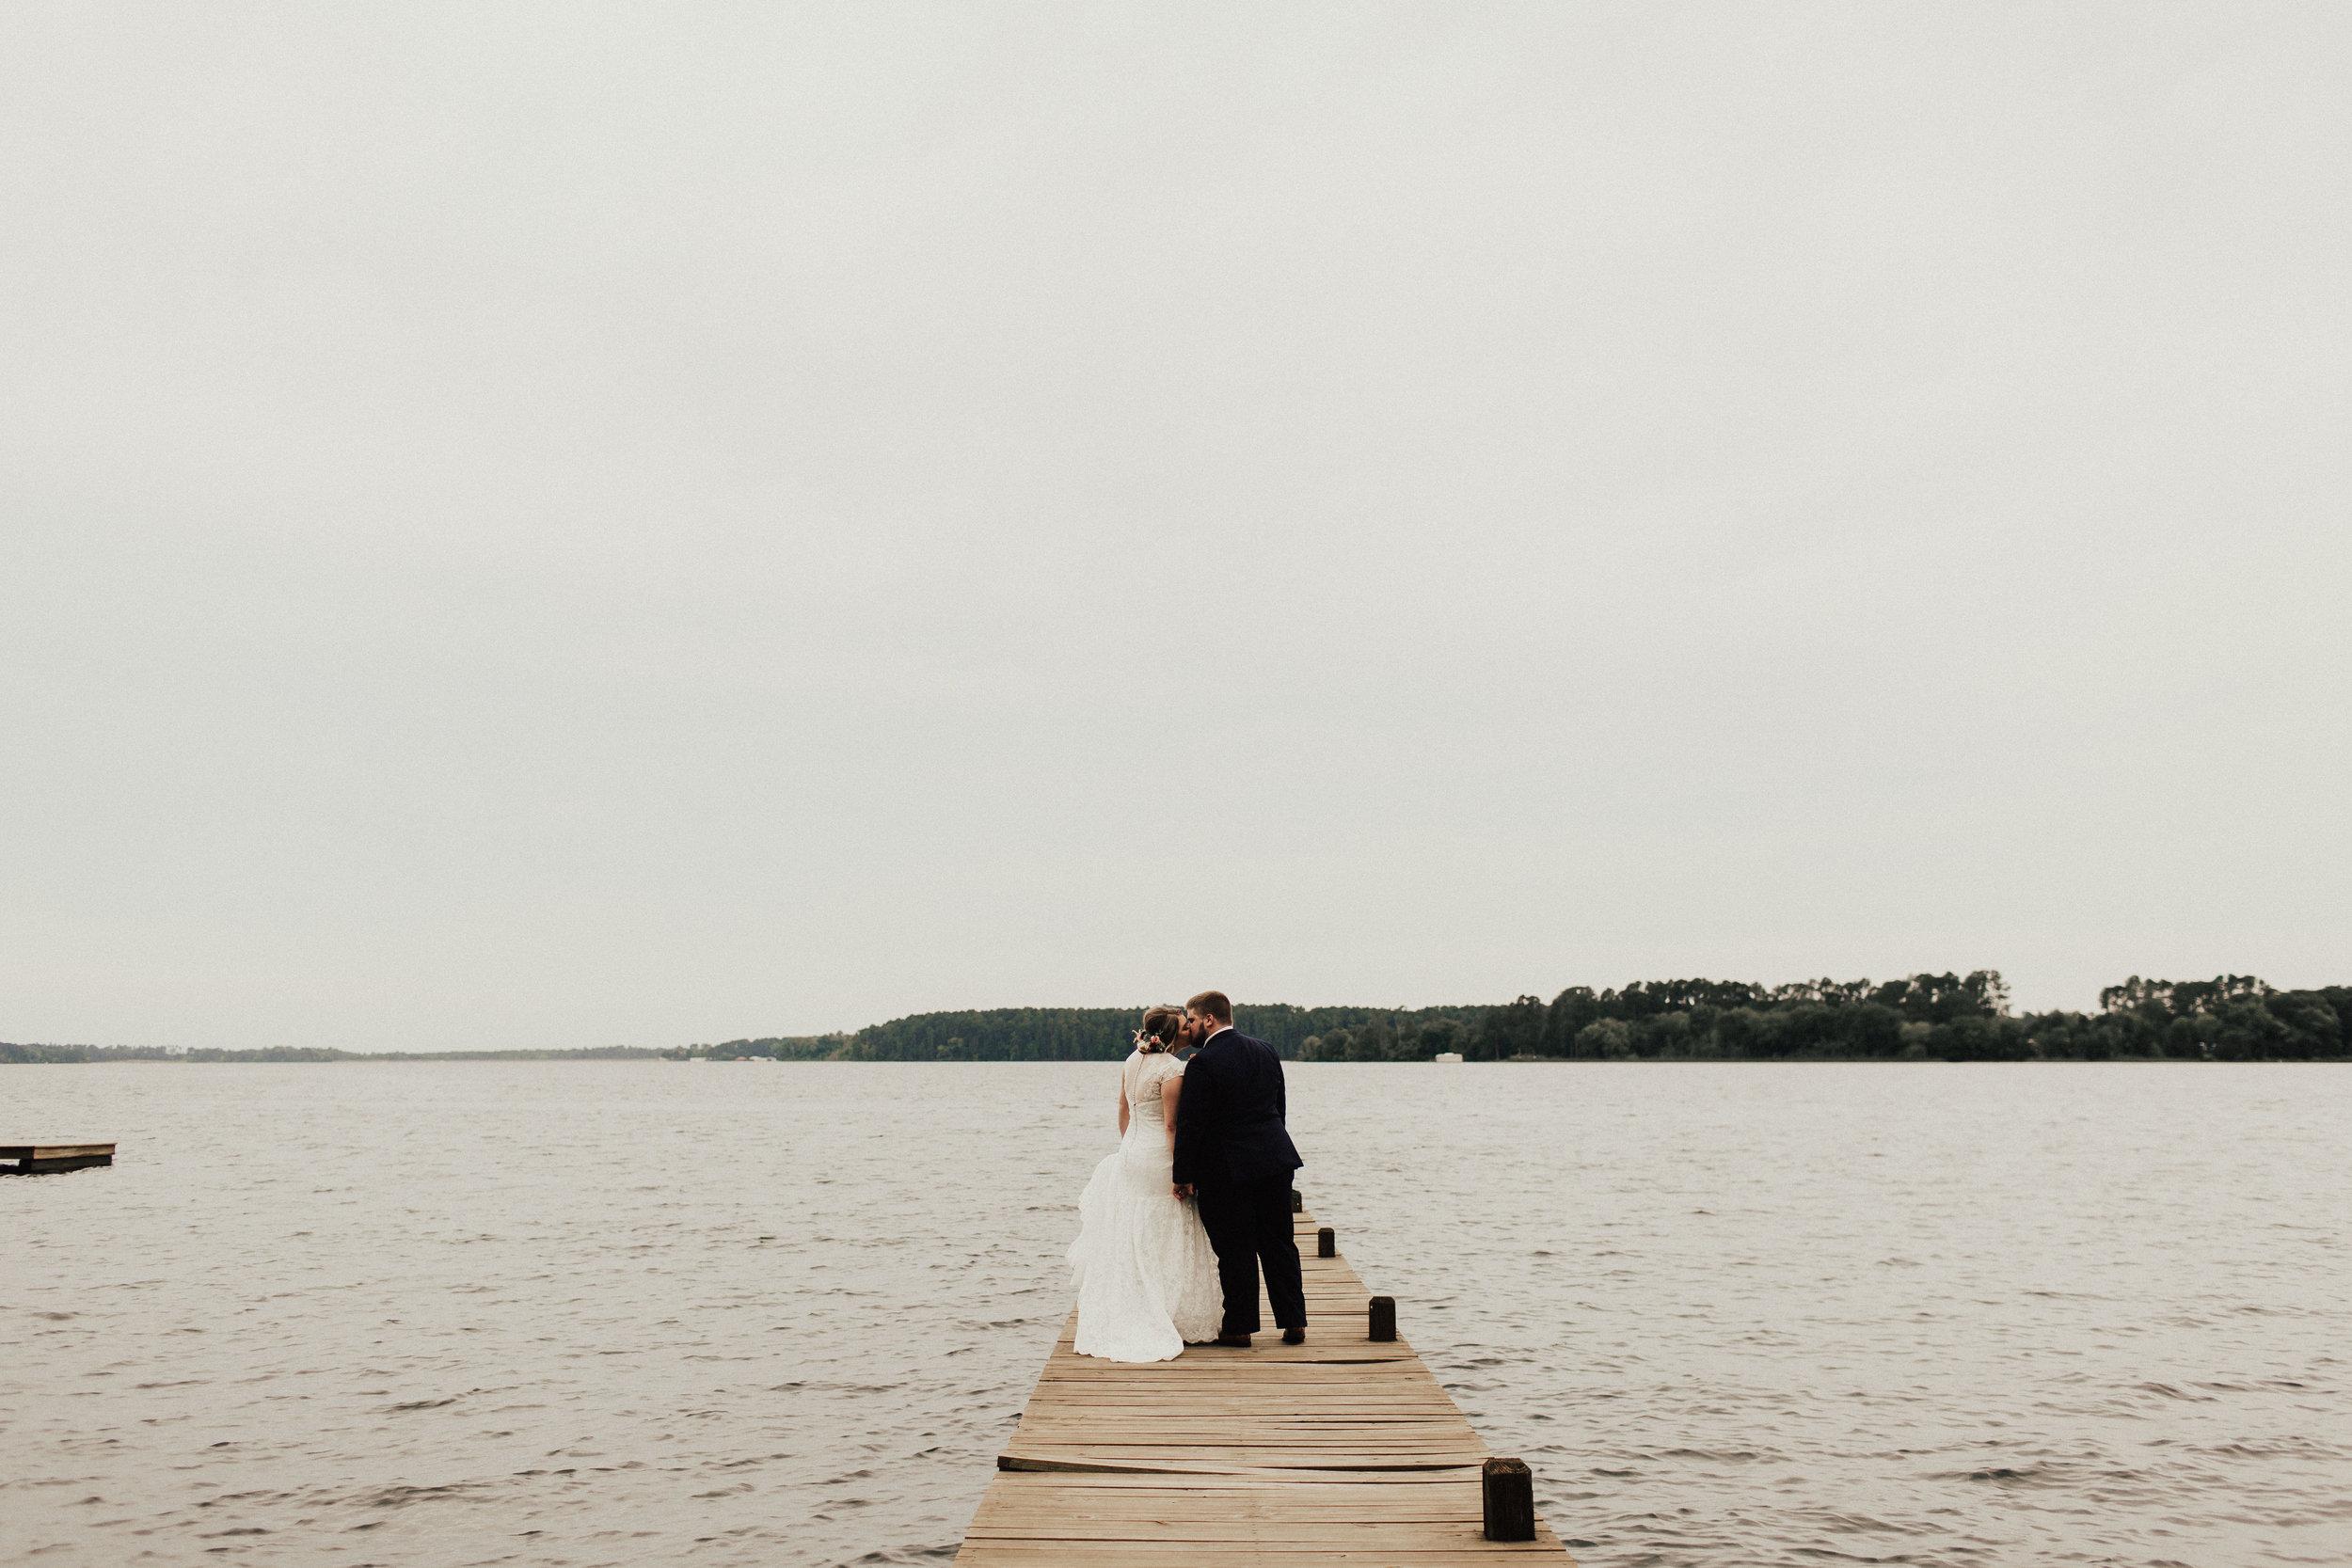 caitlin-jackson-wedding-photographer-lake-tyler-petroleum-club-texas--550.jpg